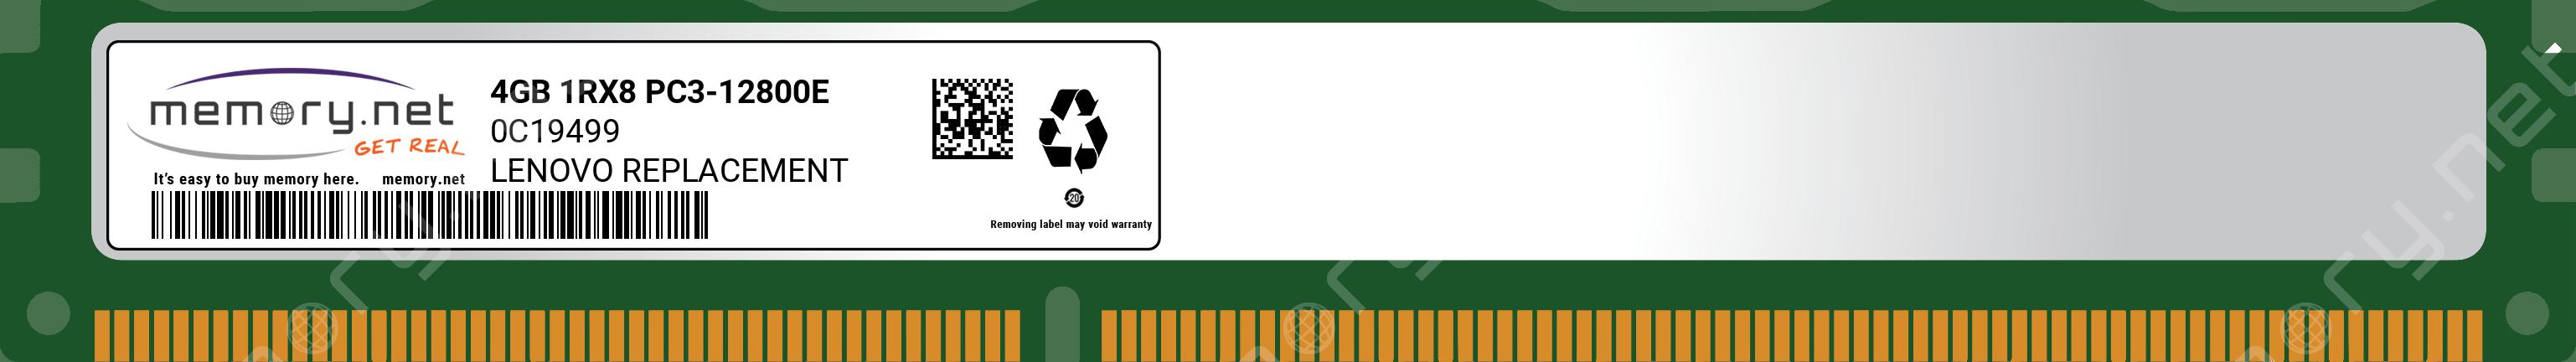 0C19499